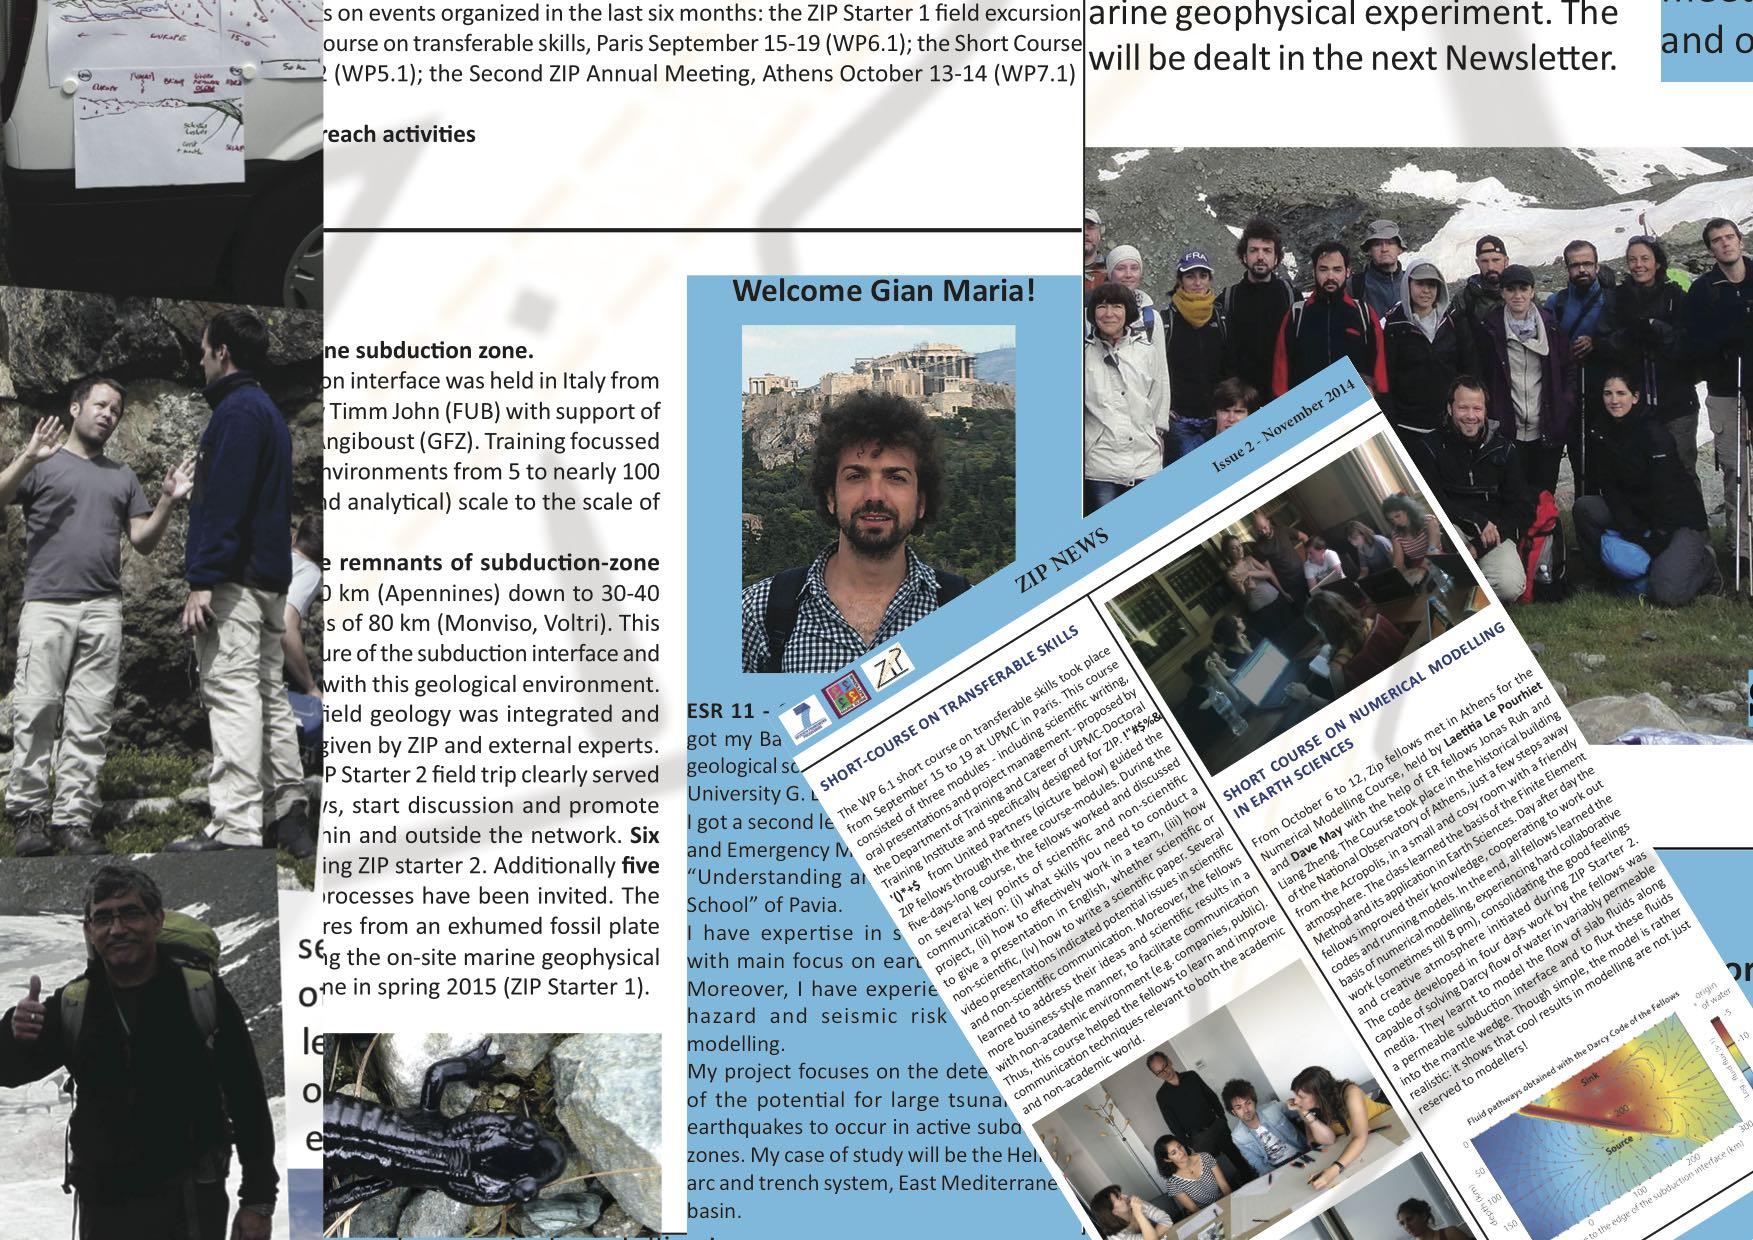 http://www.zip-itn.eu/wp-content/uploads/2014/11/ZIP-Newsletter-2.pdf